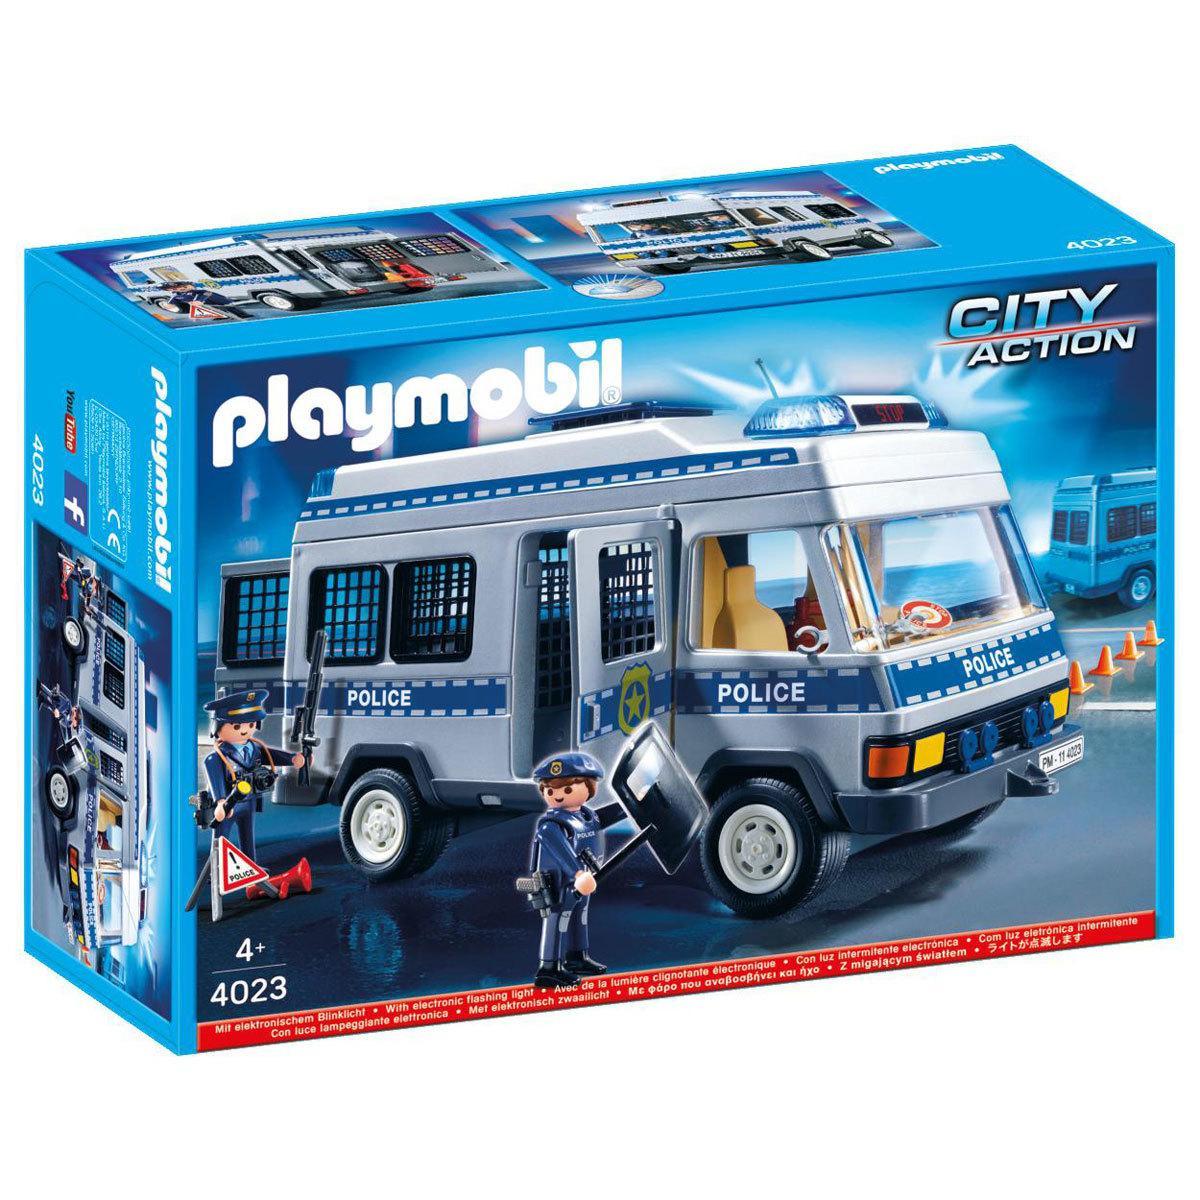 Playmobil 4023 Полиция Автозак с мигалкой Полицейский фургон Police Van with Police Officers